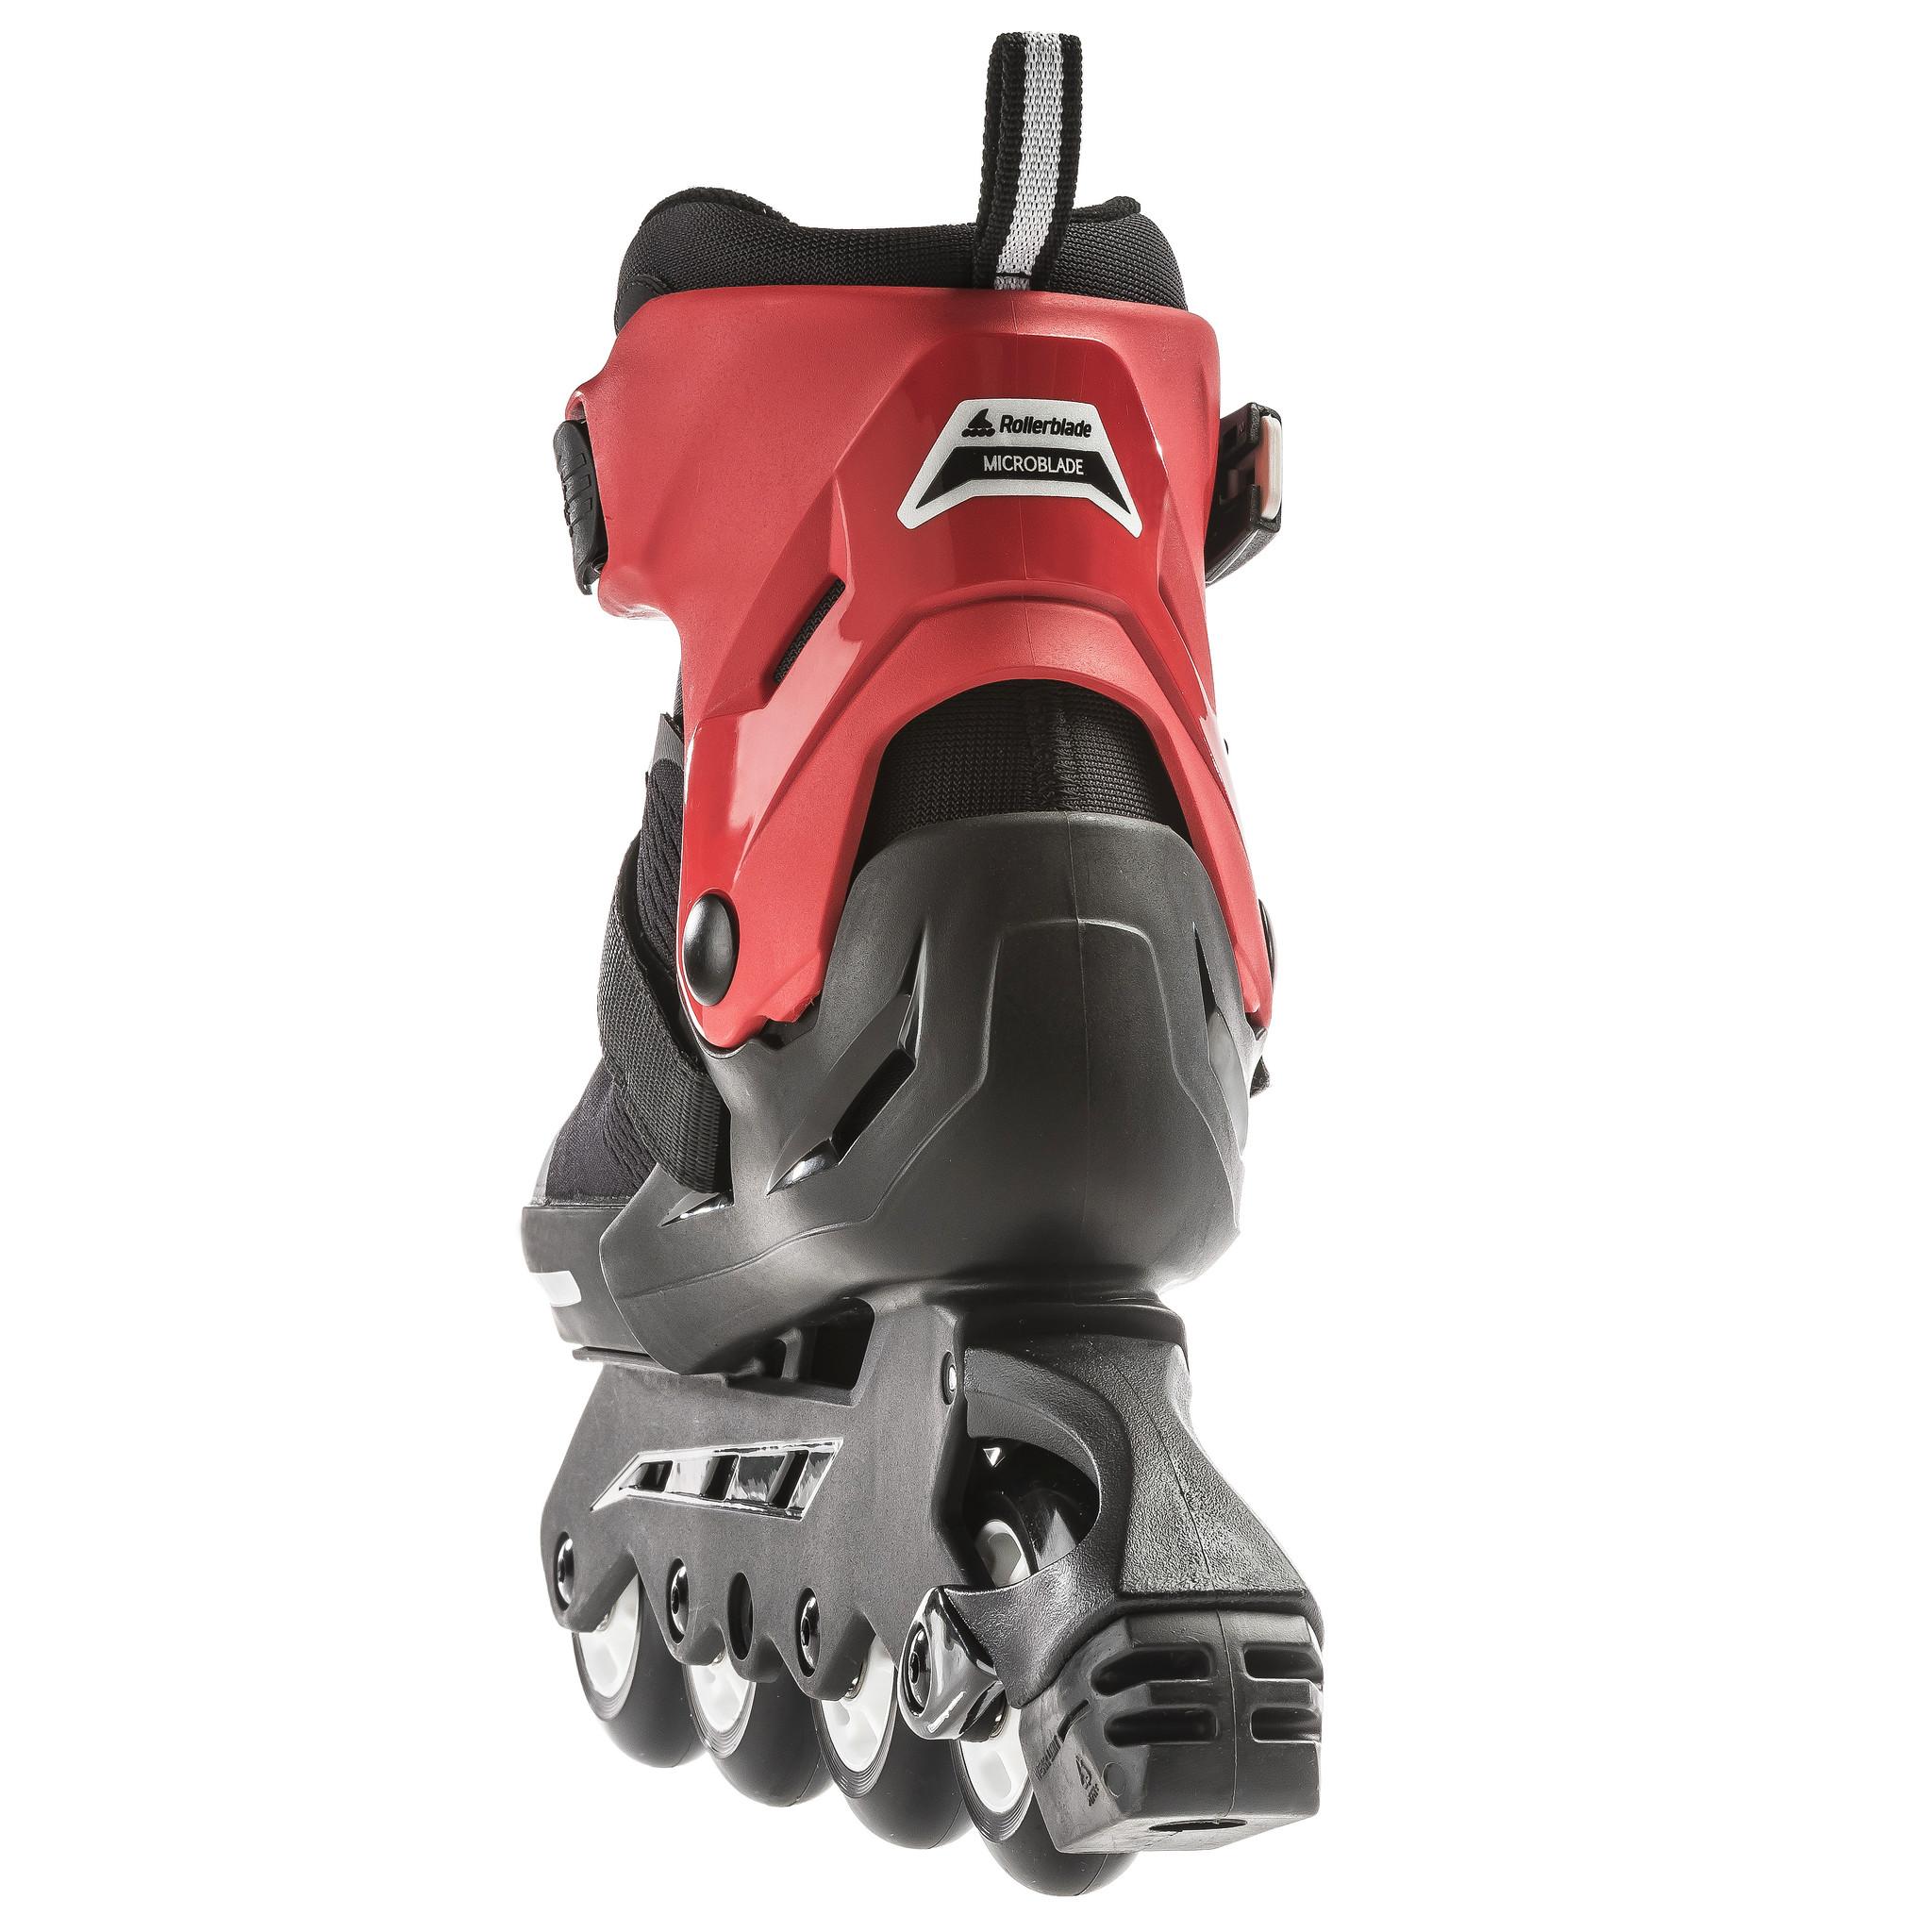 Rollerblade Rollerblade Microblade Black / Red